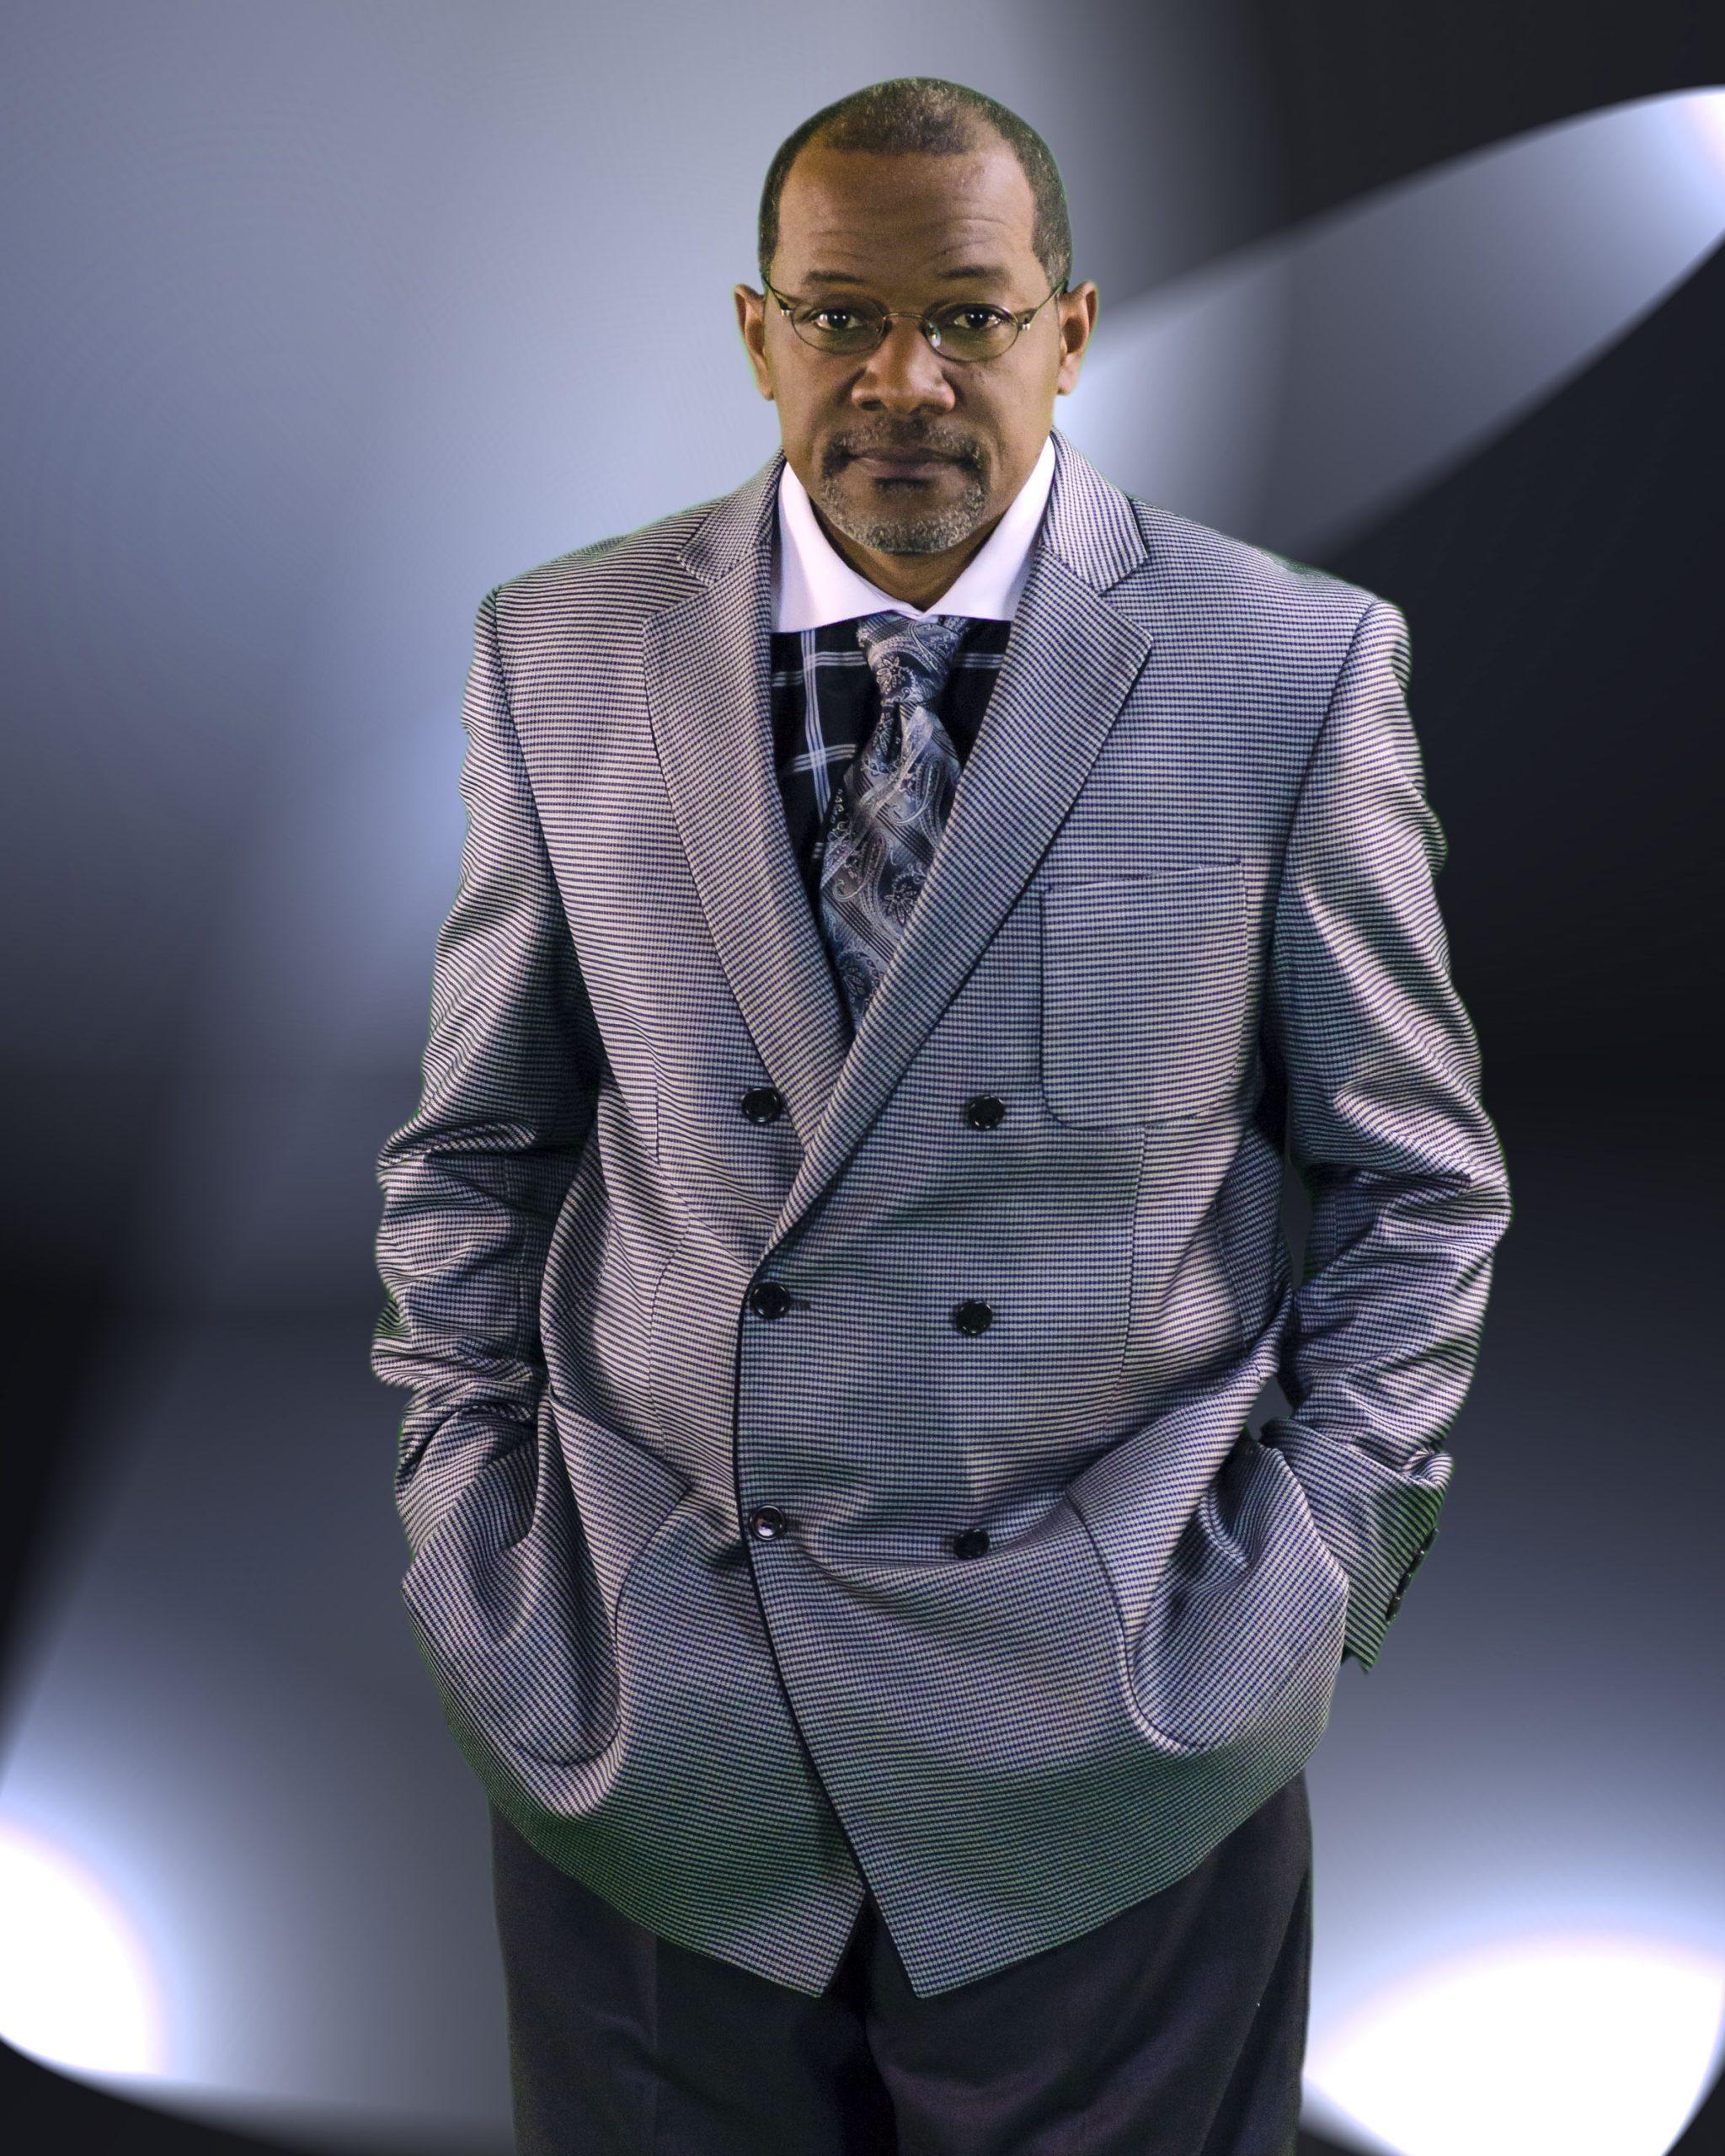 Pastor Shon Davis